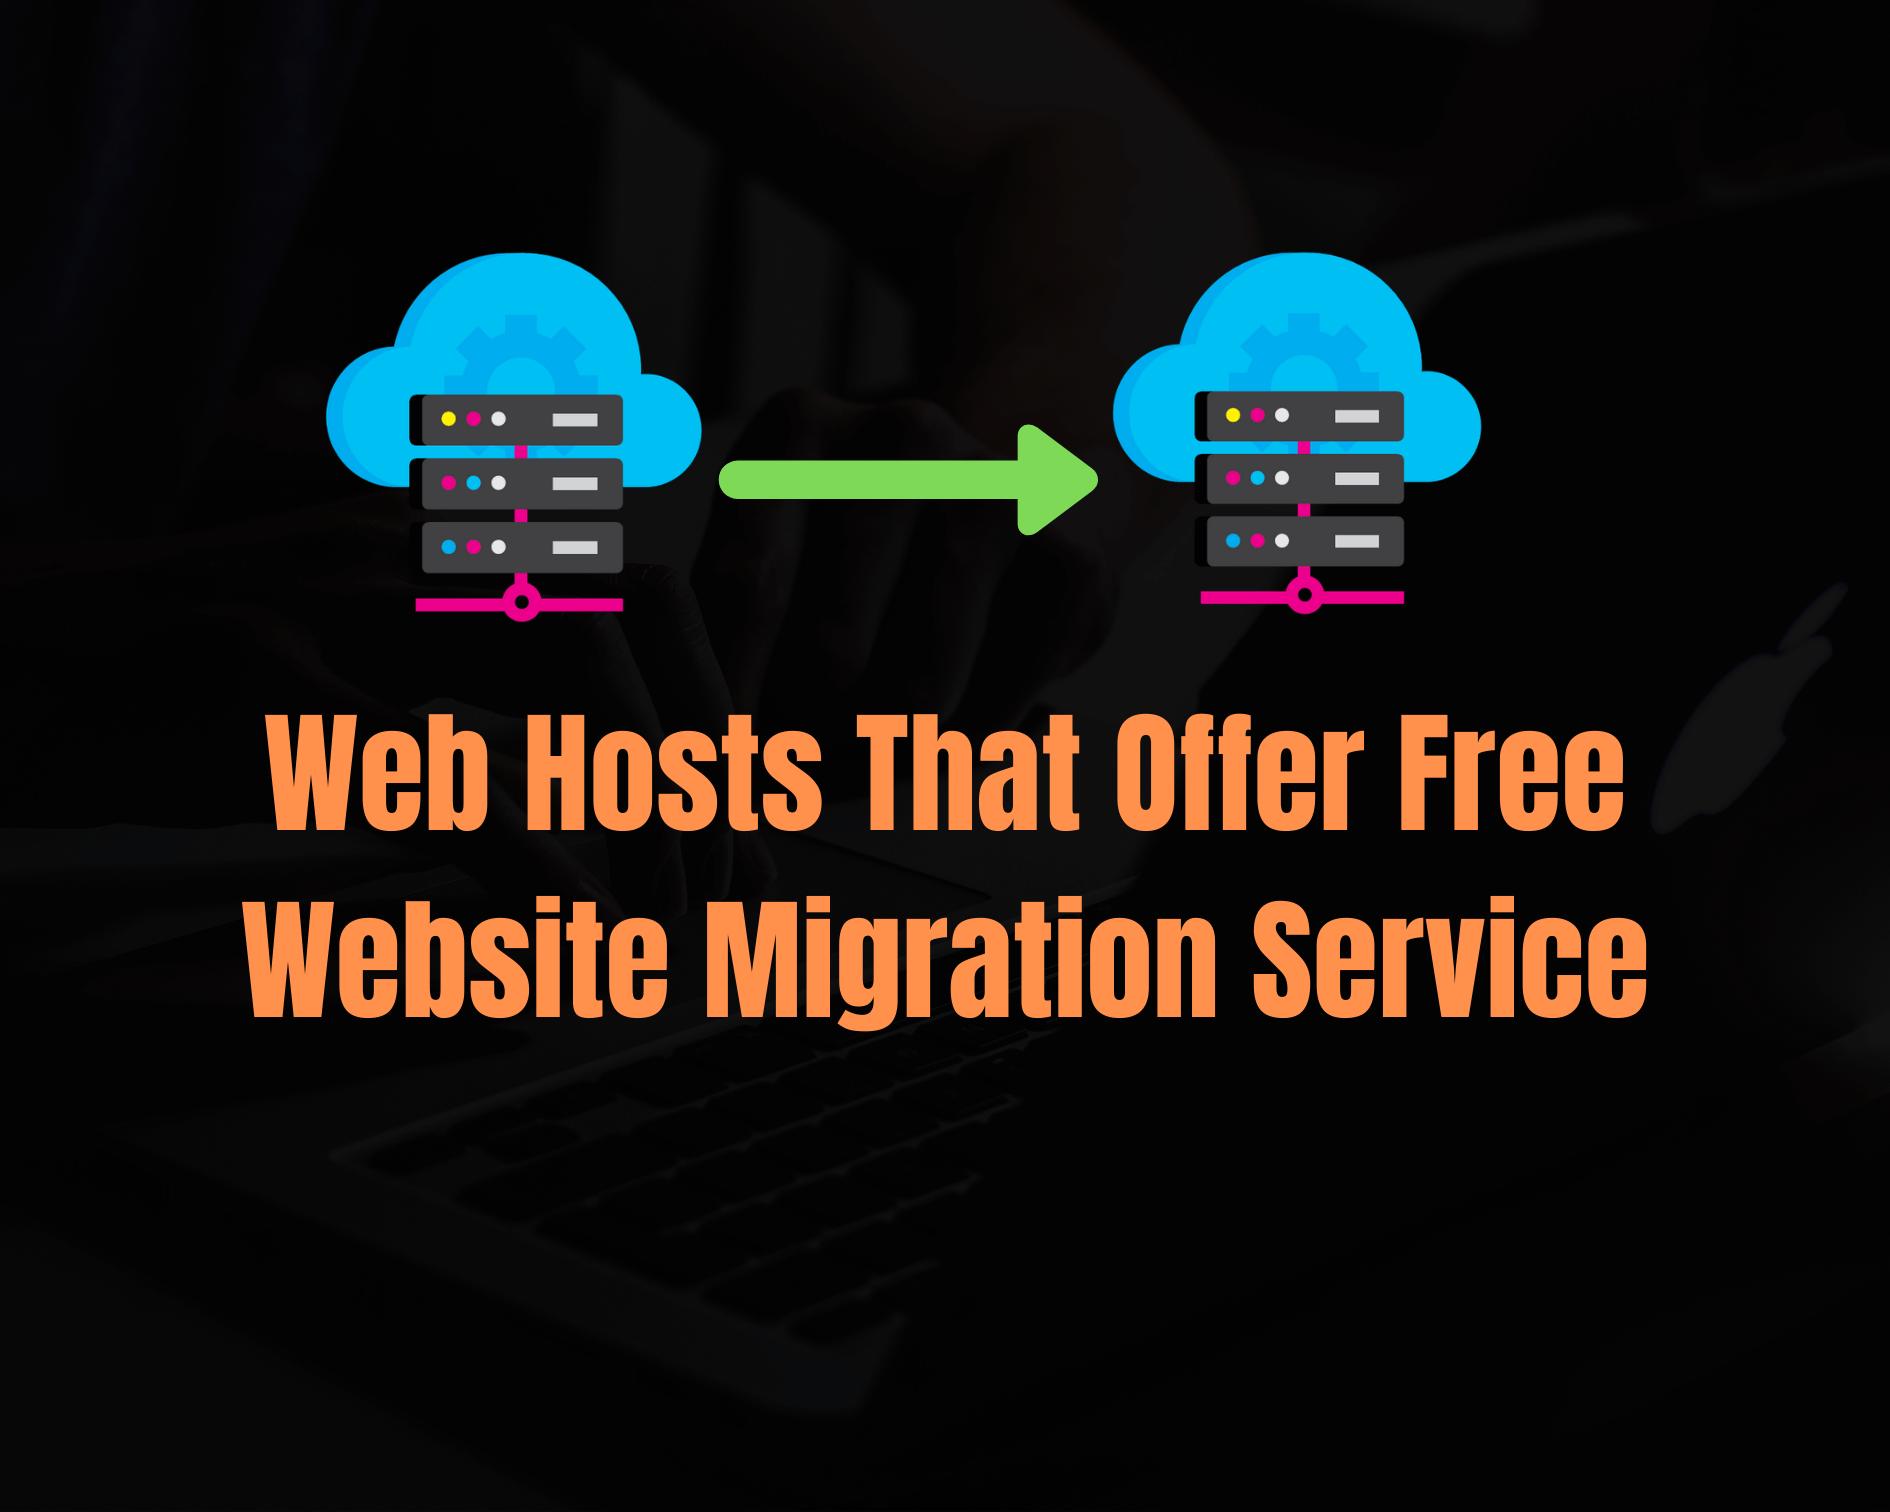 Top 10 Web Hosts That Offer Free Website Migration Service